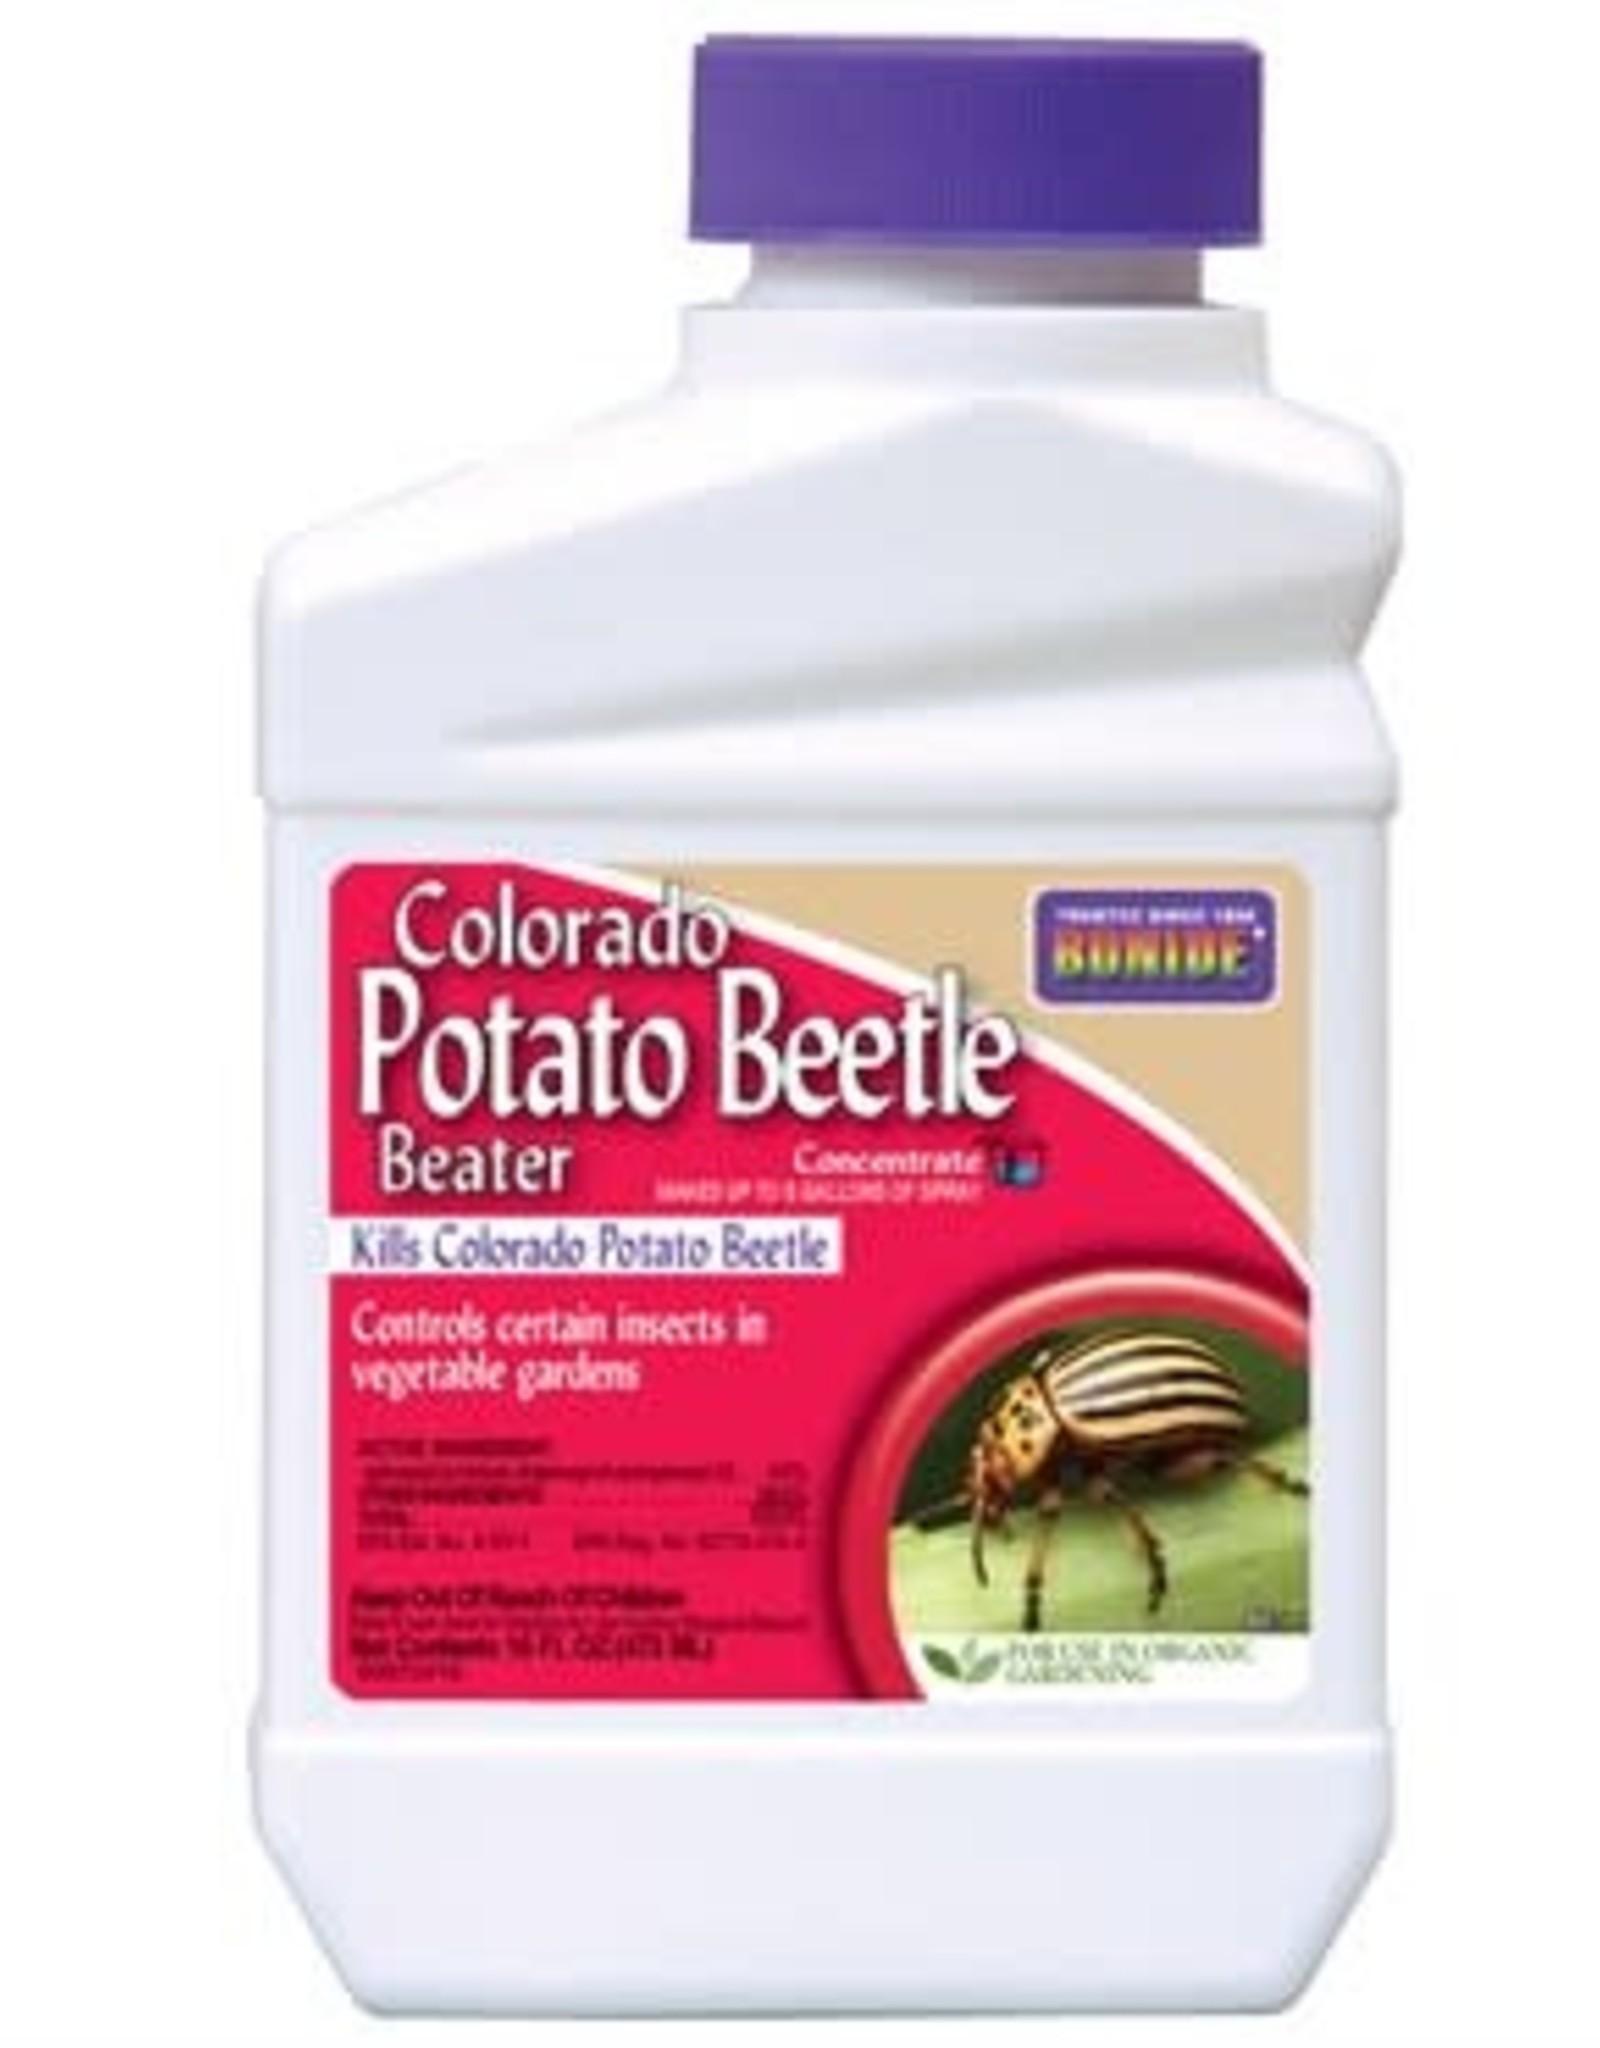 Bonide Colorado Potato Beetle Beater